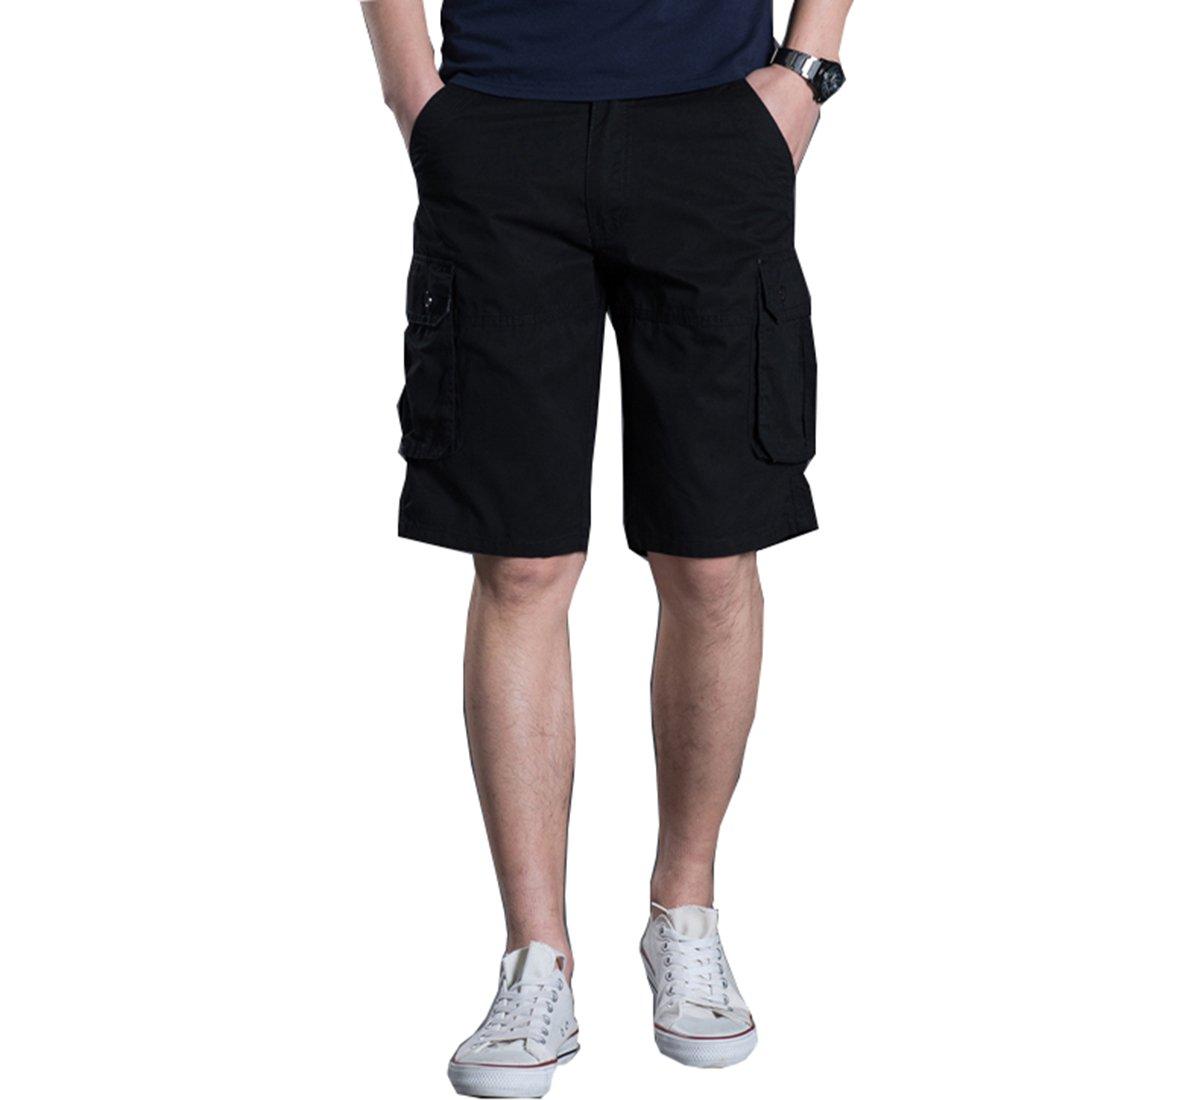 Men's Outdoor Summer Lightweight Cotton Loose Fit Multi Pocket Cargo Shorts (Black, 38)